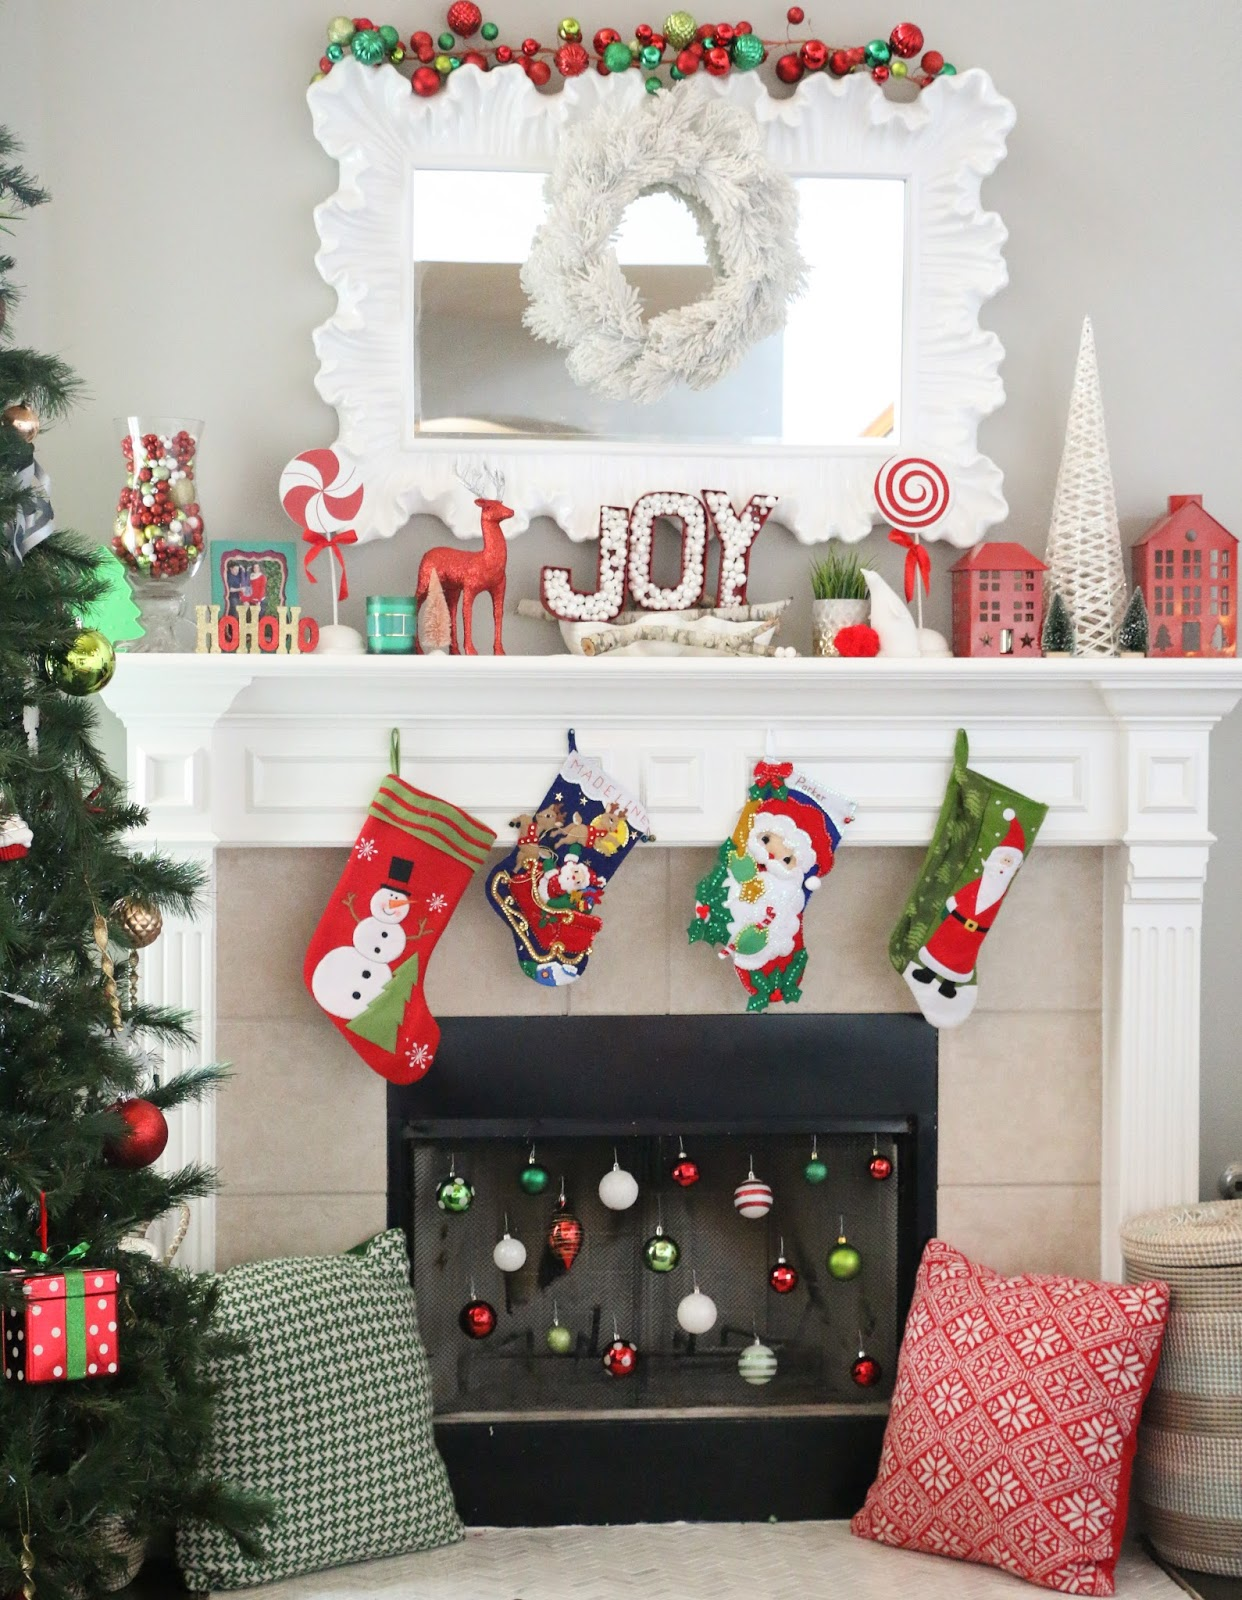 Christmas Decorative Fireplace Screens | www.topsimages.com